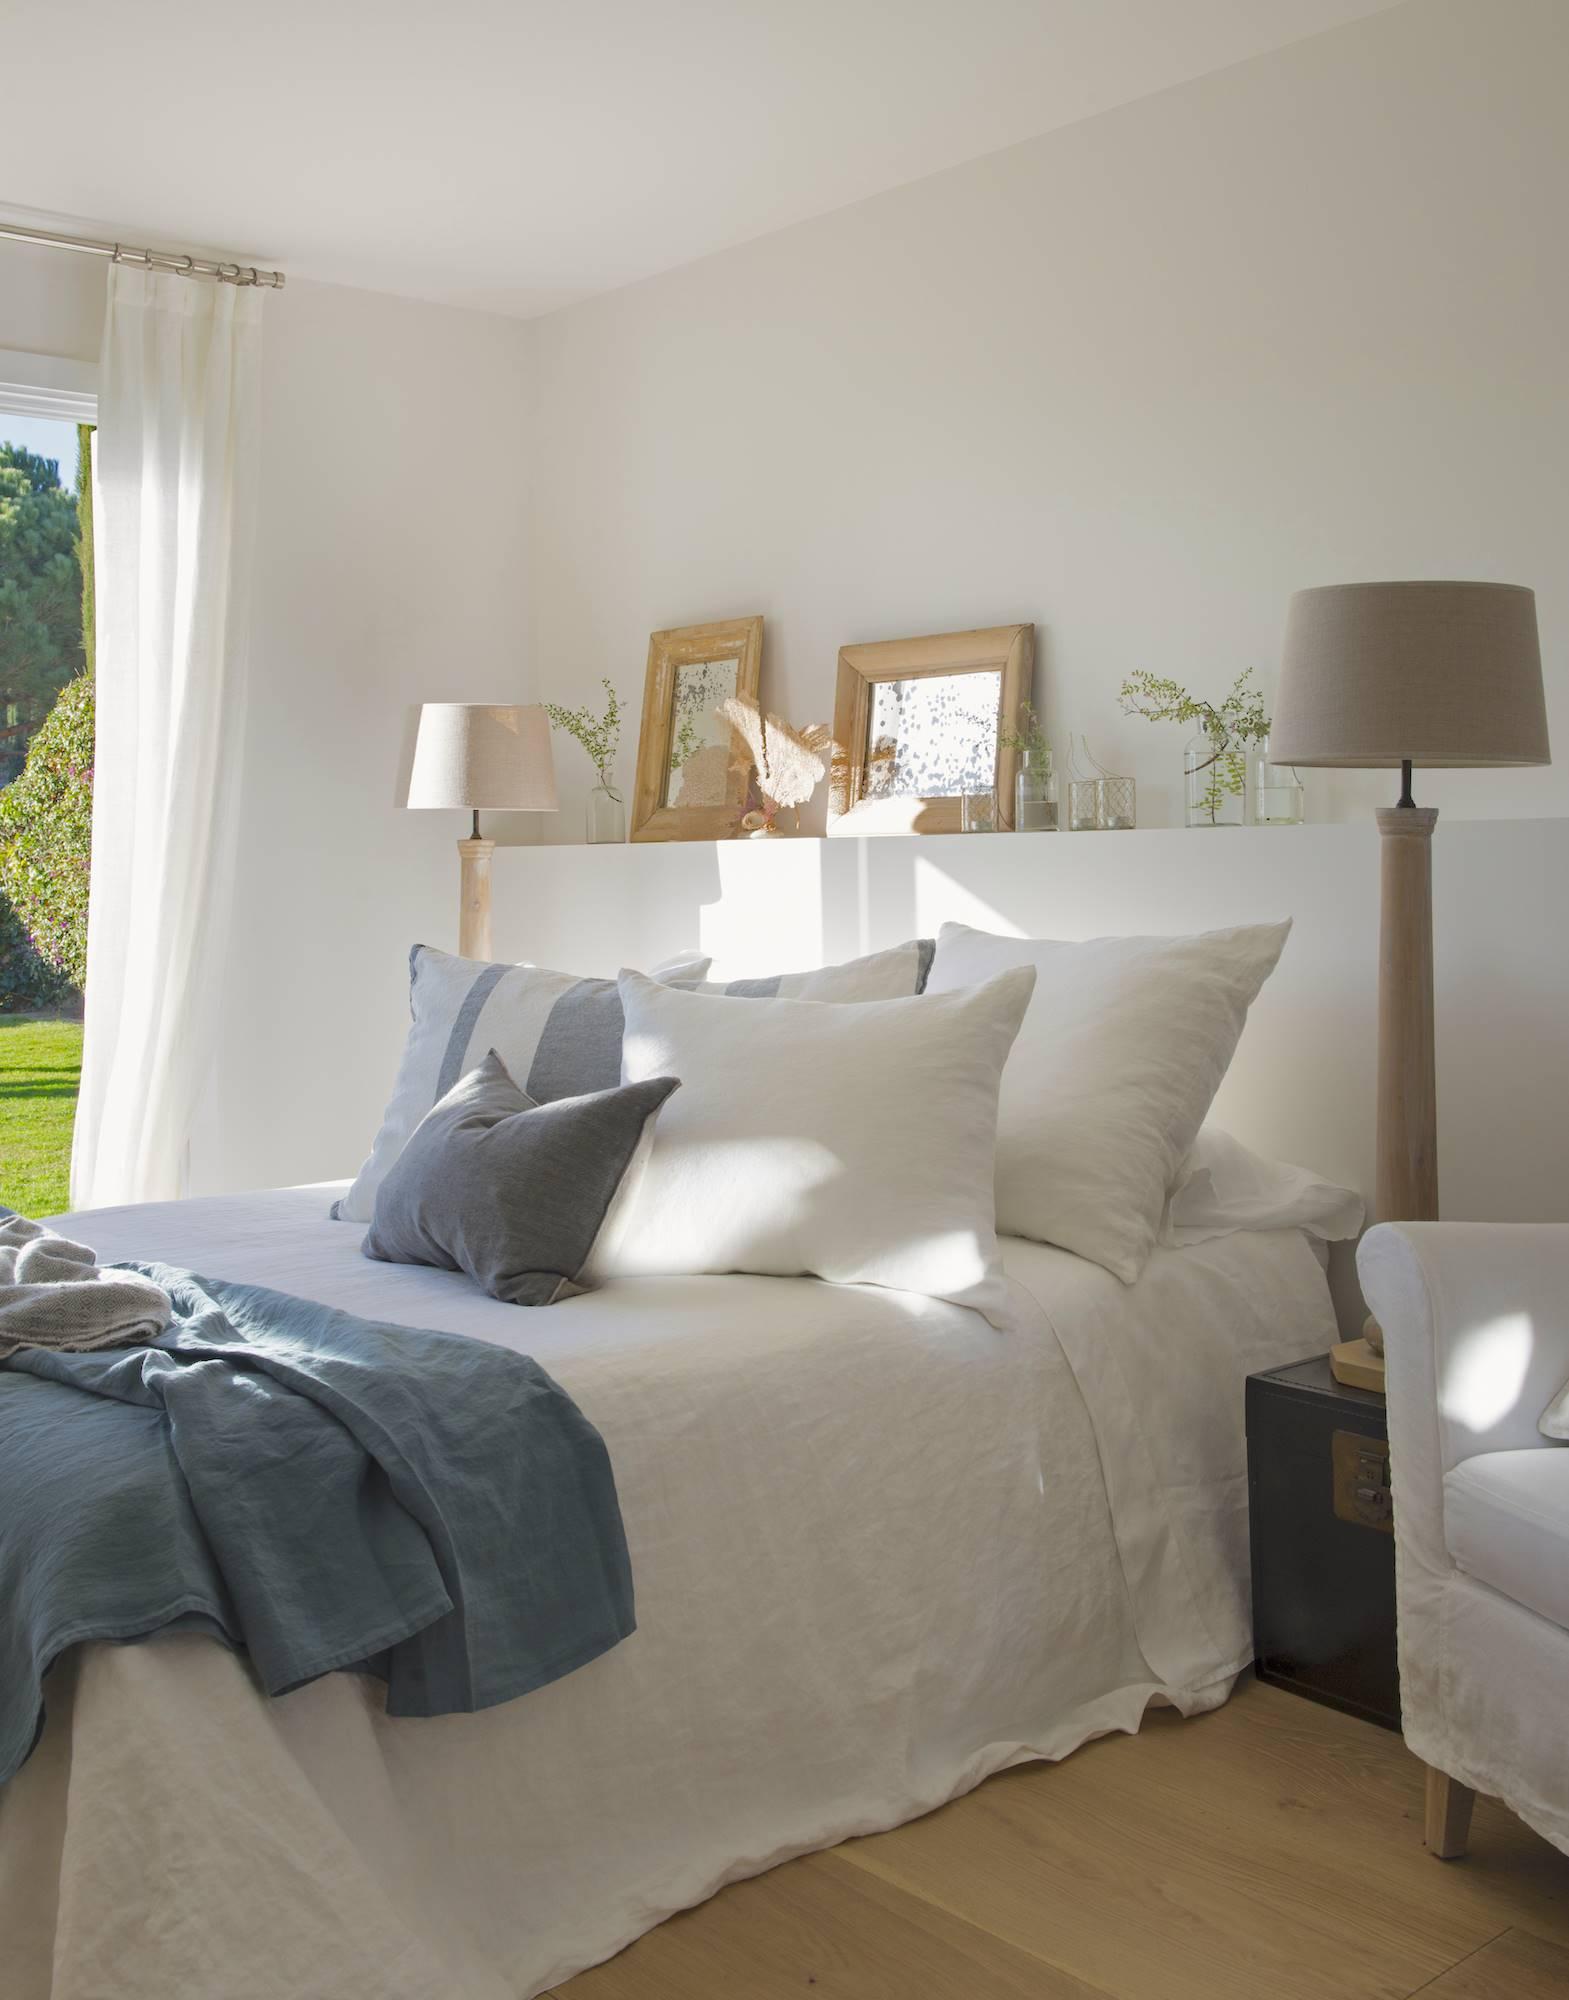 50 trucos para iluminar mejor tu casa - Luz para dormitorio ...